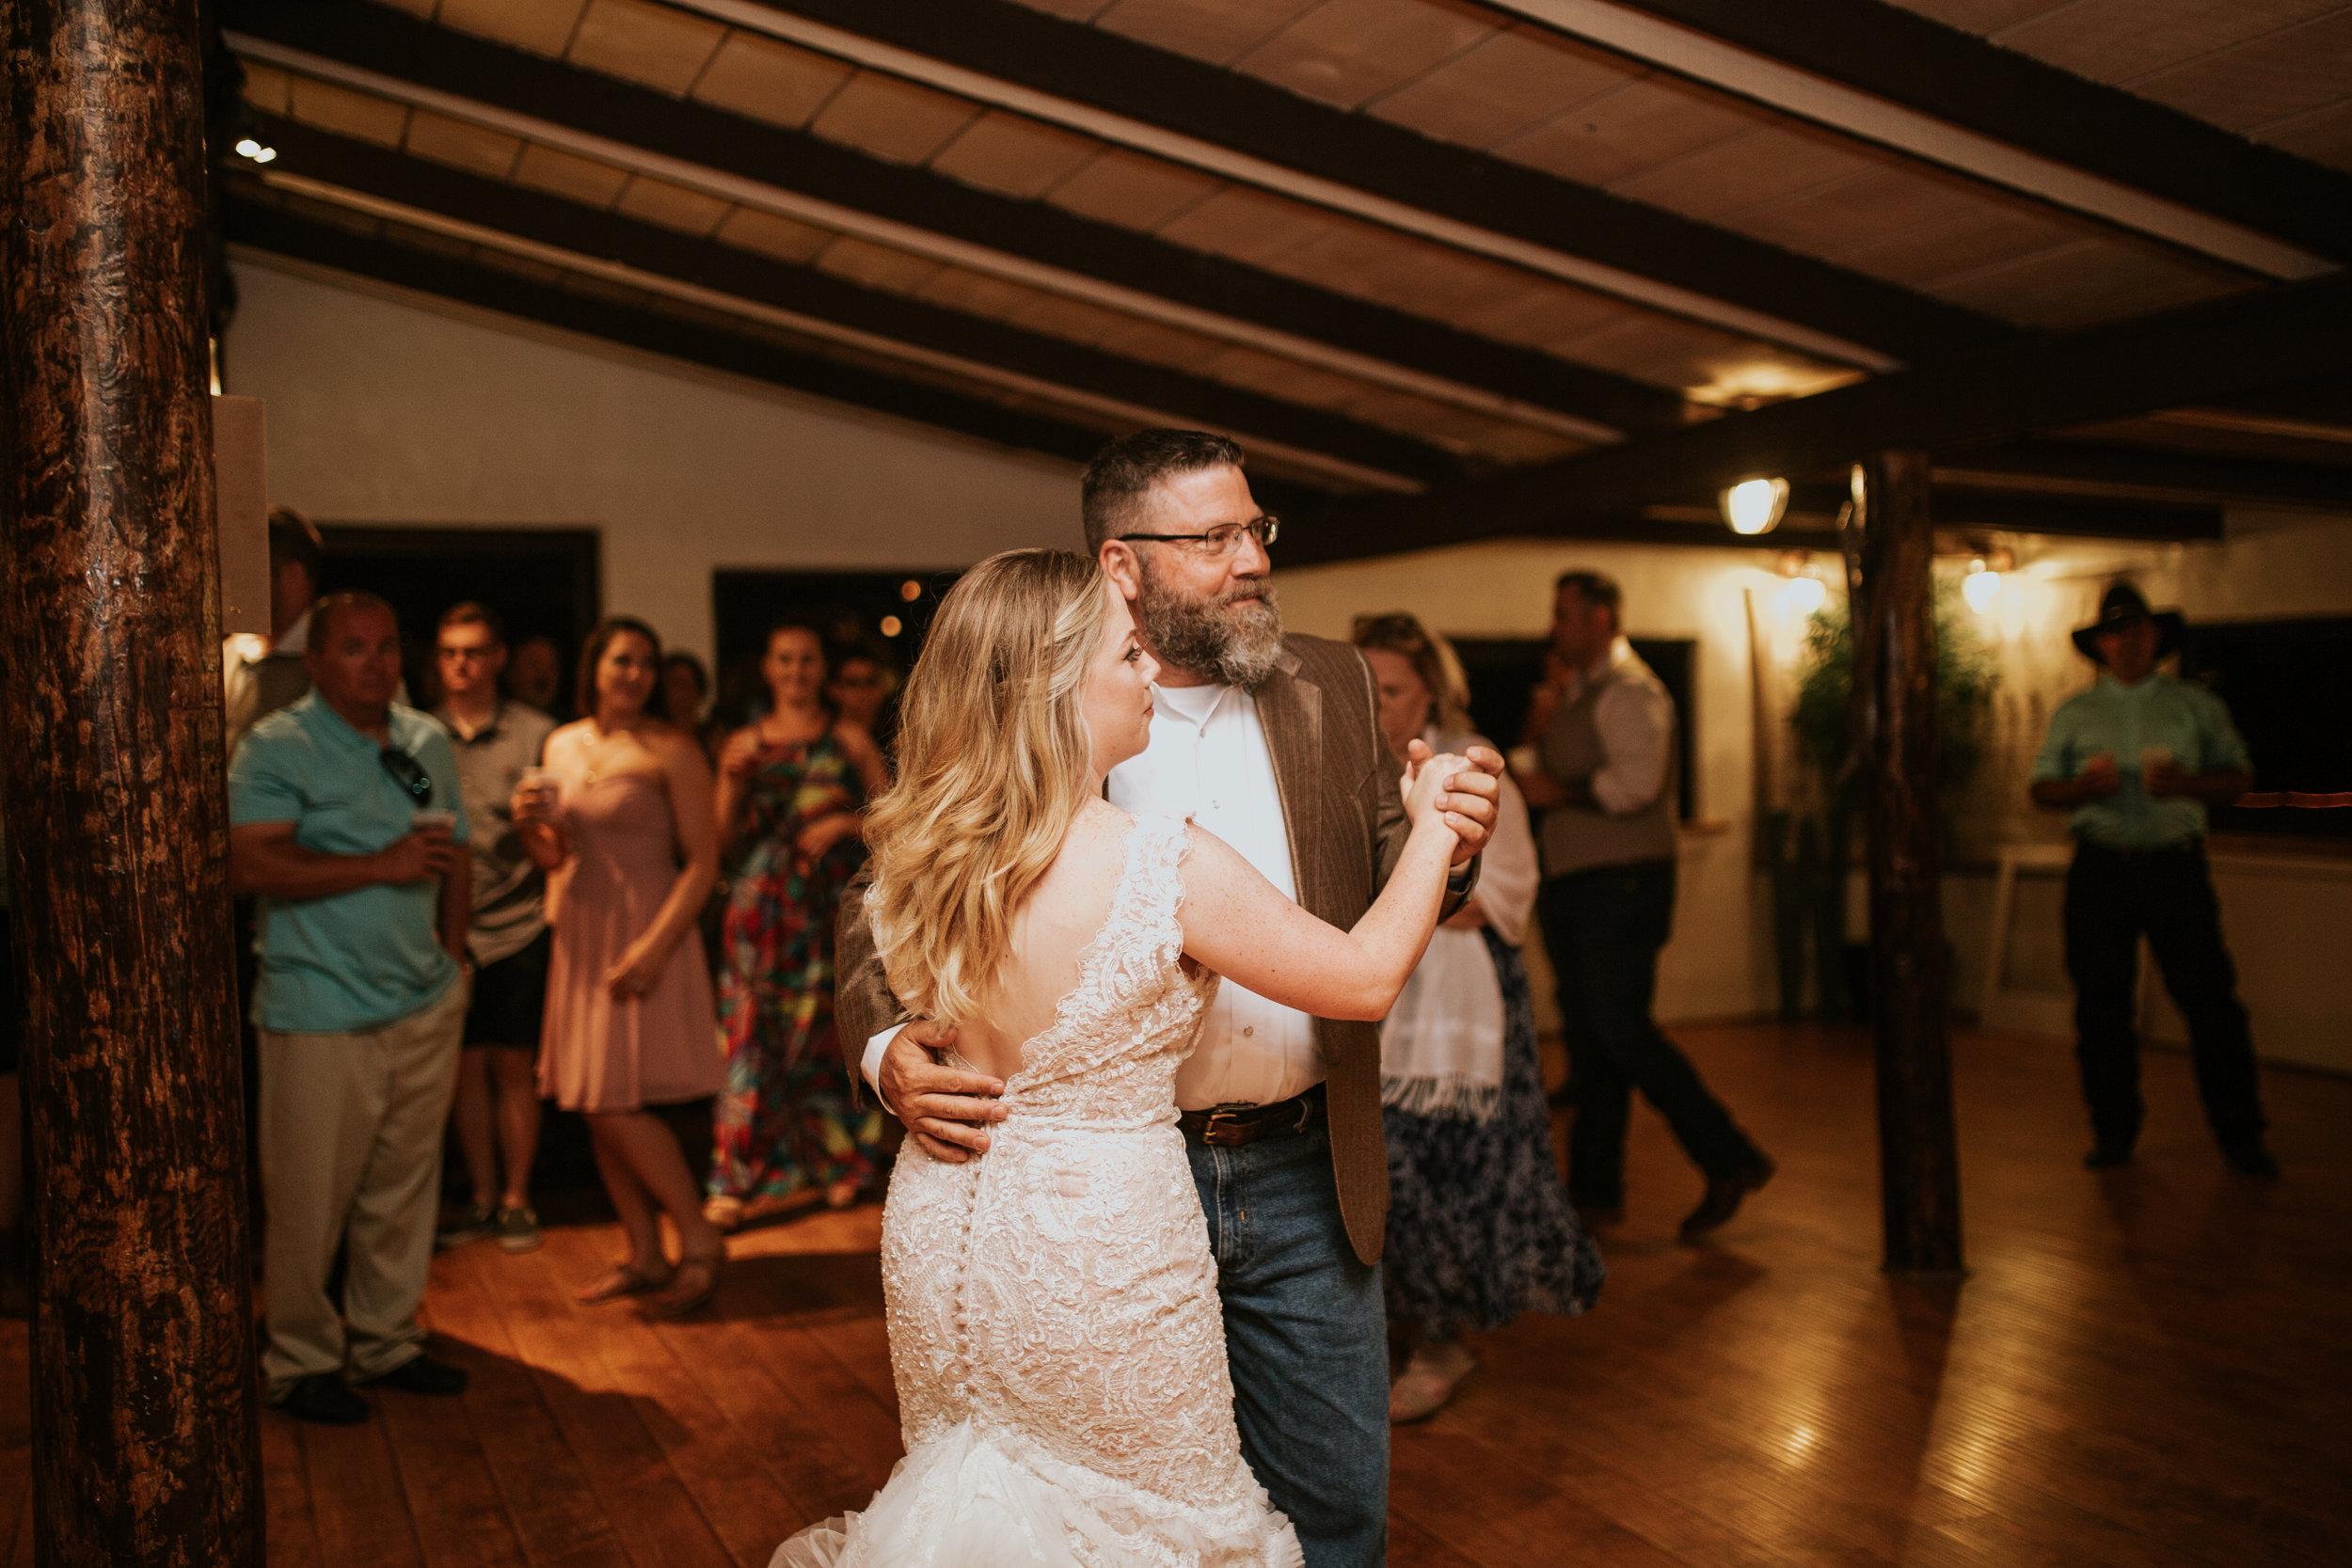 william-taylor-fabens-texas-wedding-63